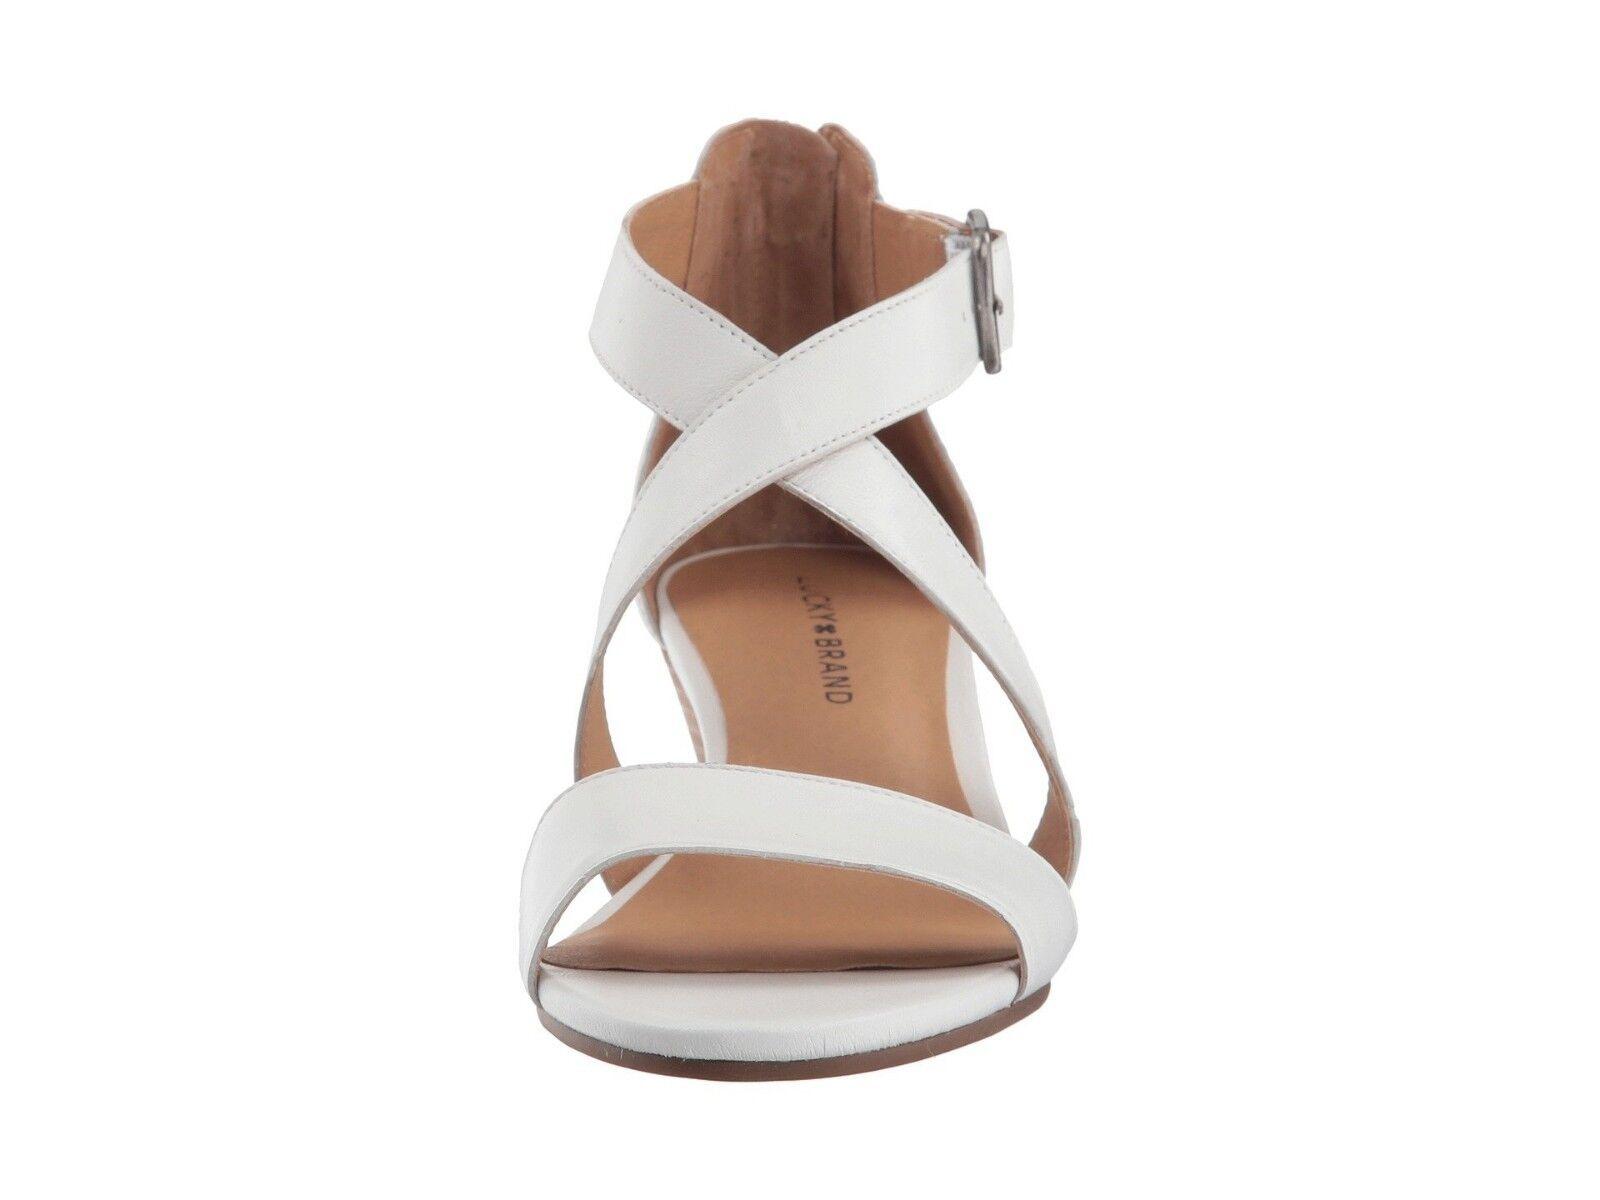 Lucky Brand Jenley Bright Weiß Italian Nappa Leder Strappy Strappy Strappy Wedge Sandale 10 626f96